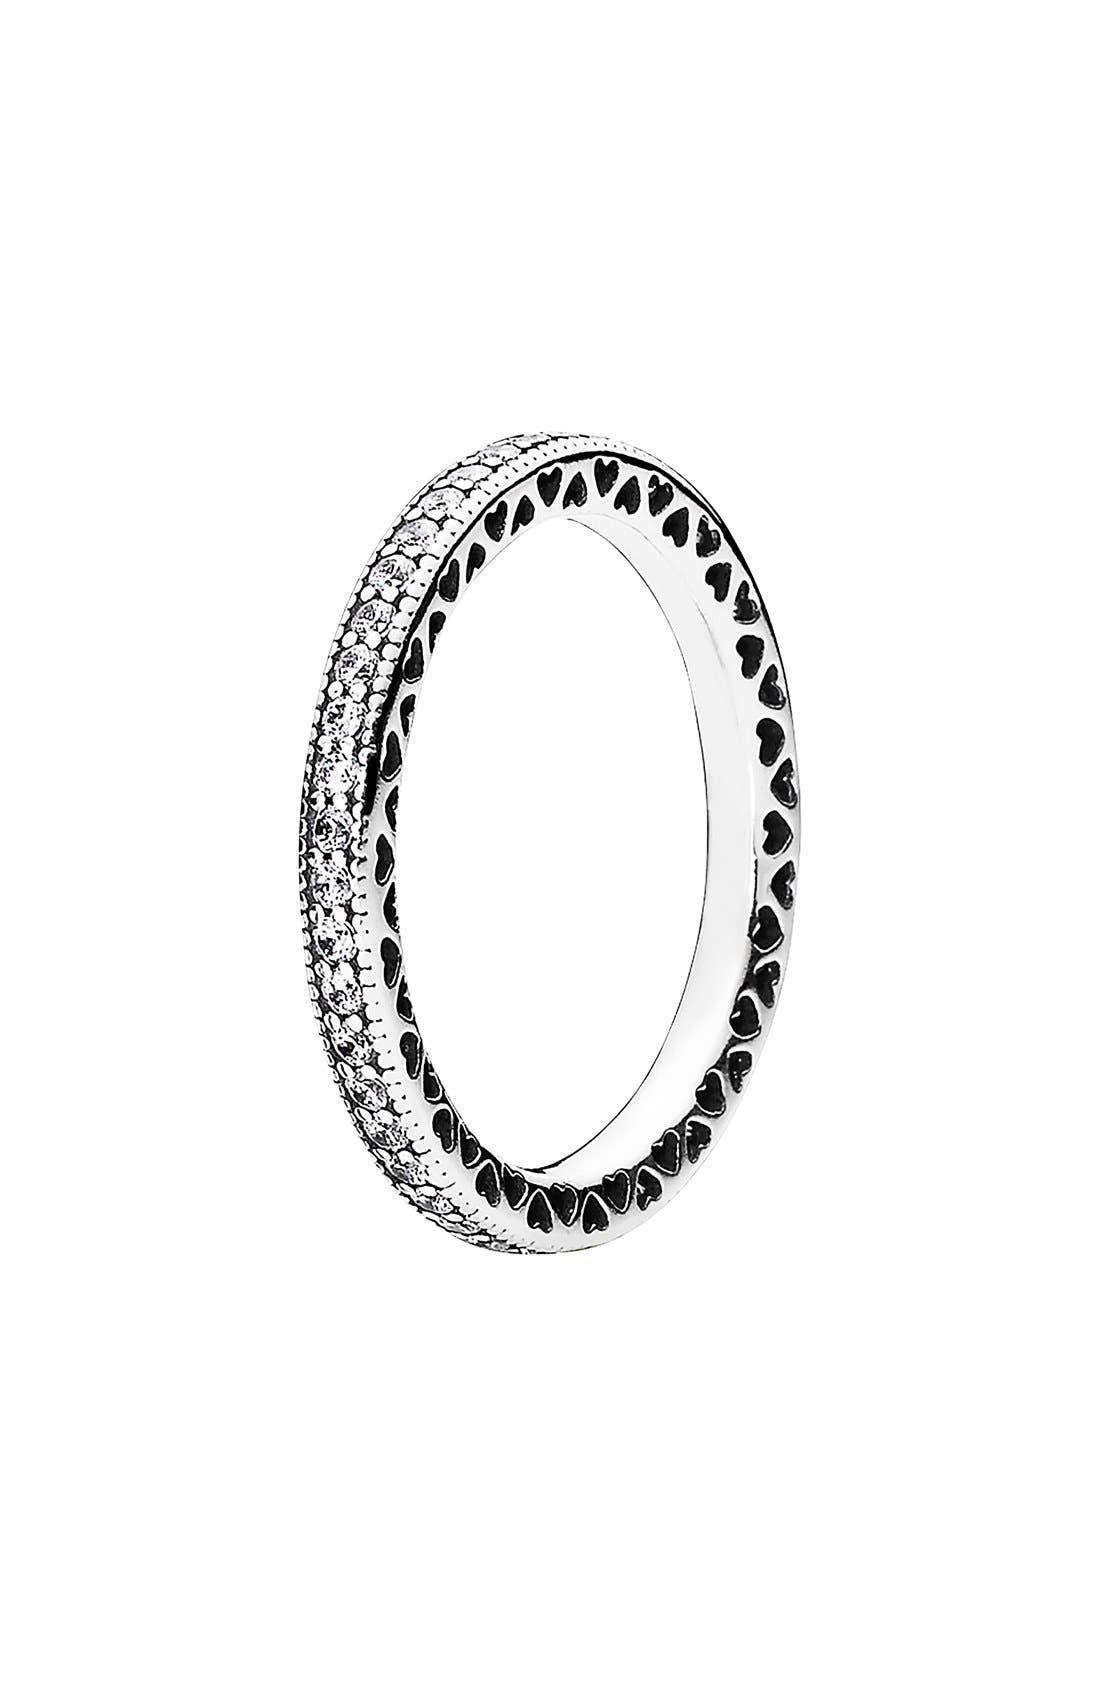 Alternate Image 1 Selected - PANDORA 'Hearts of PANDORA' Band Ring